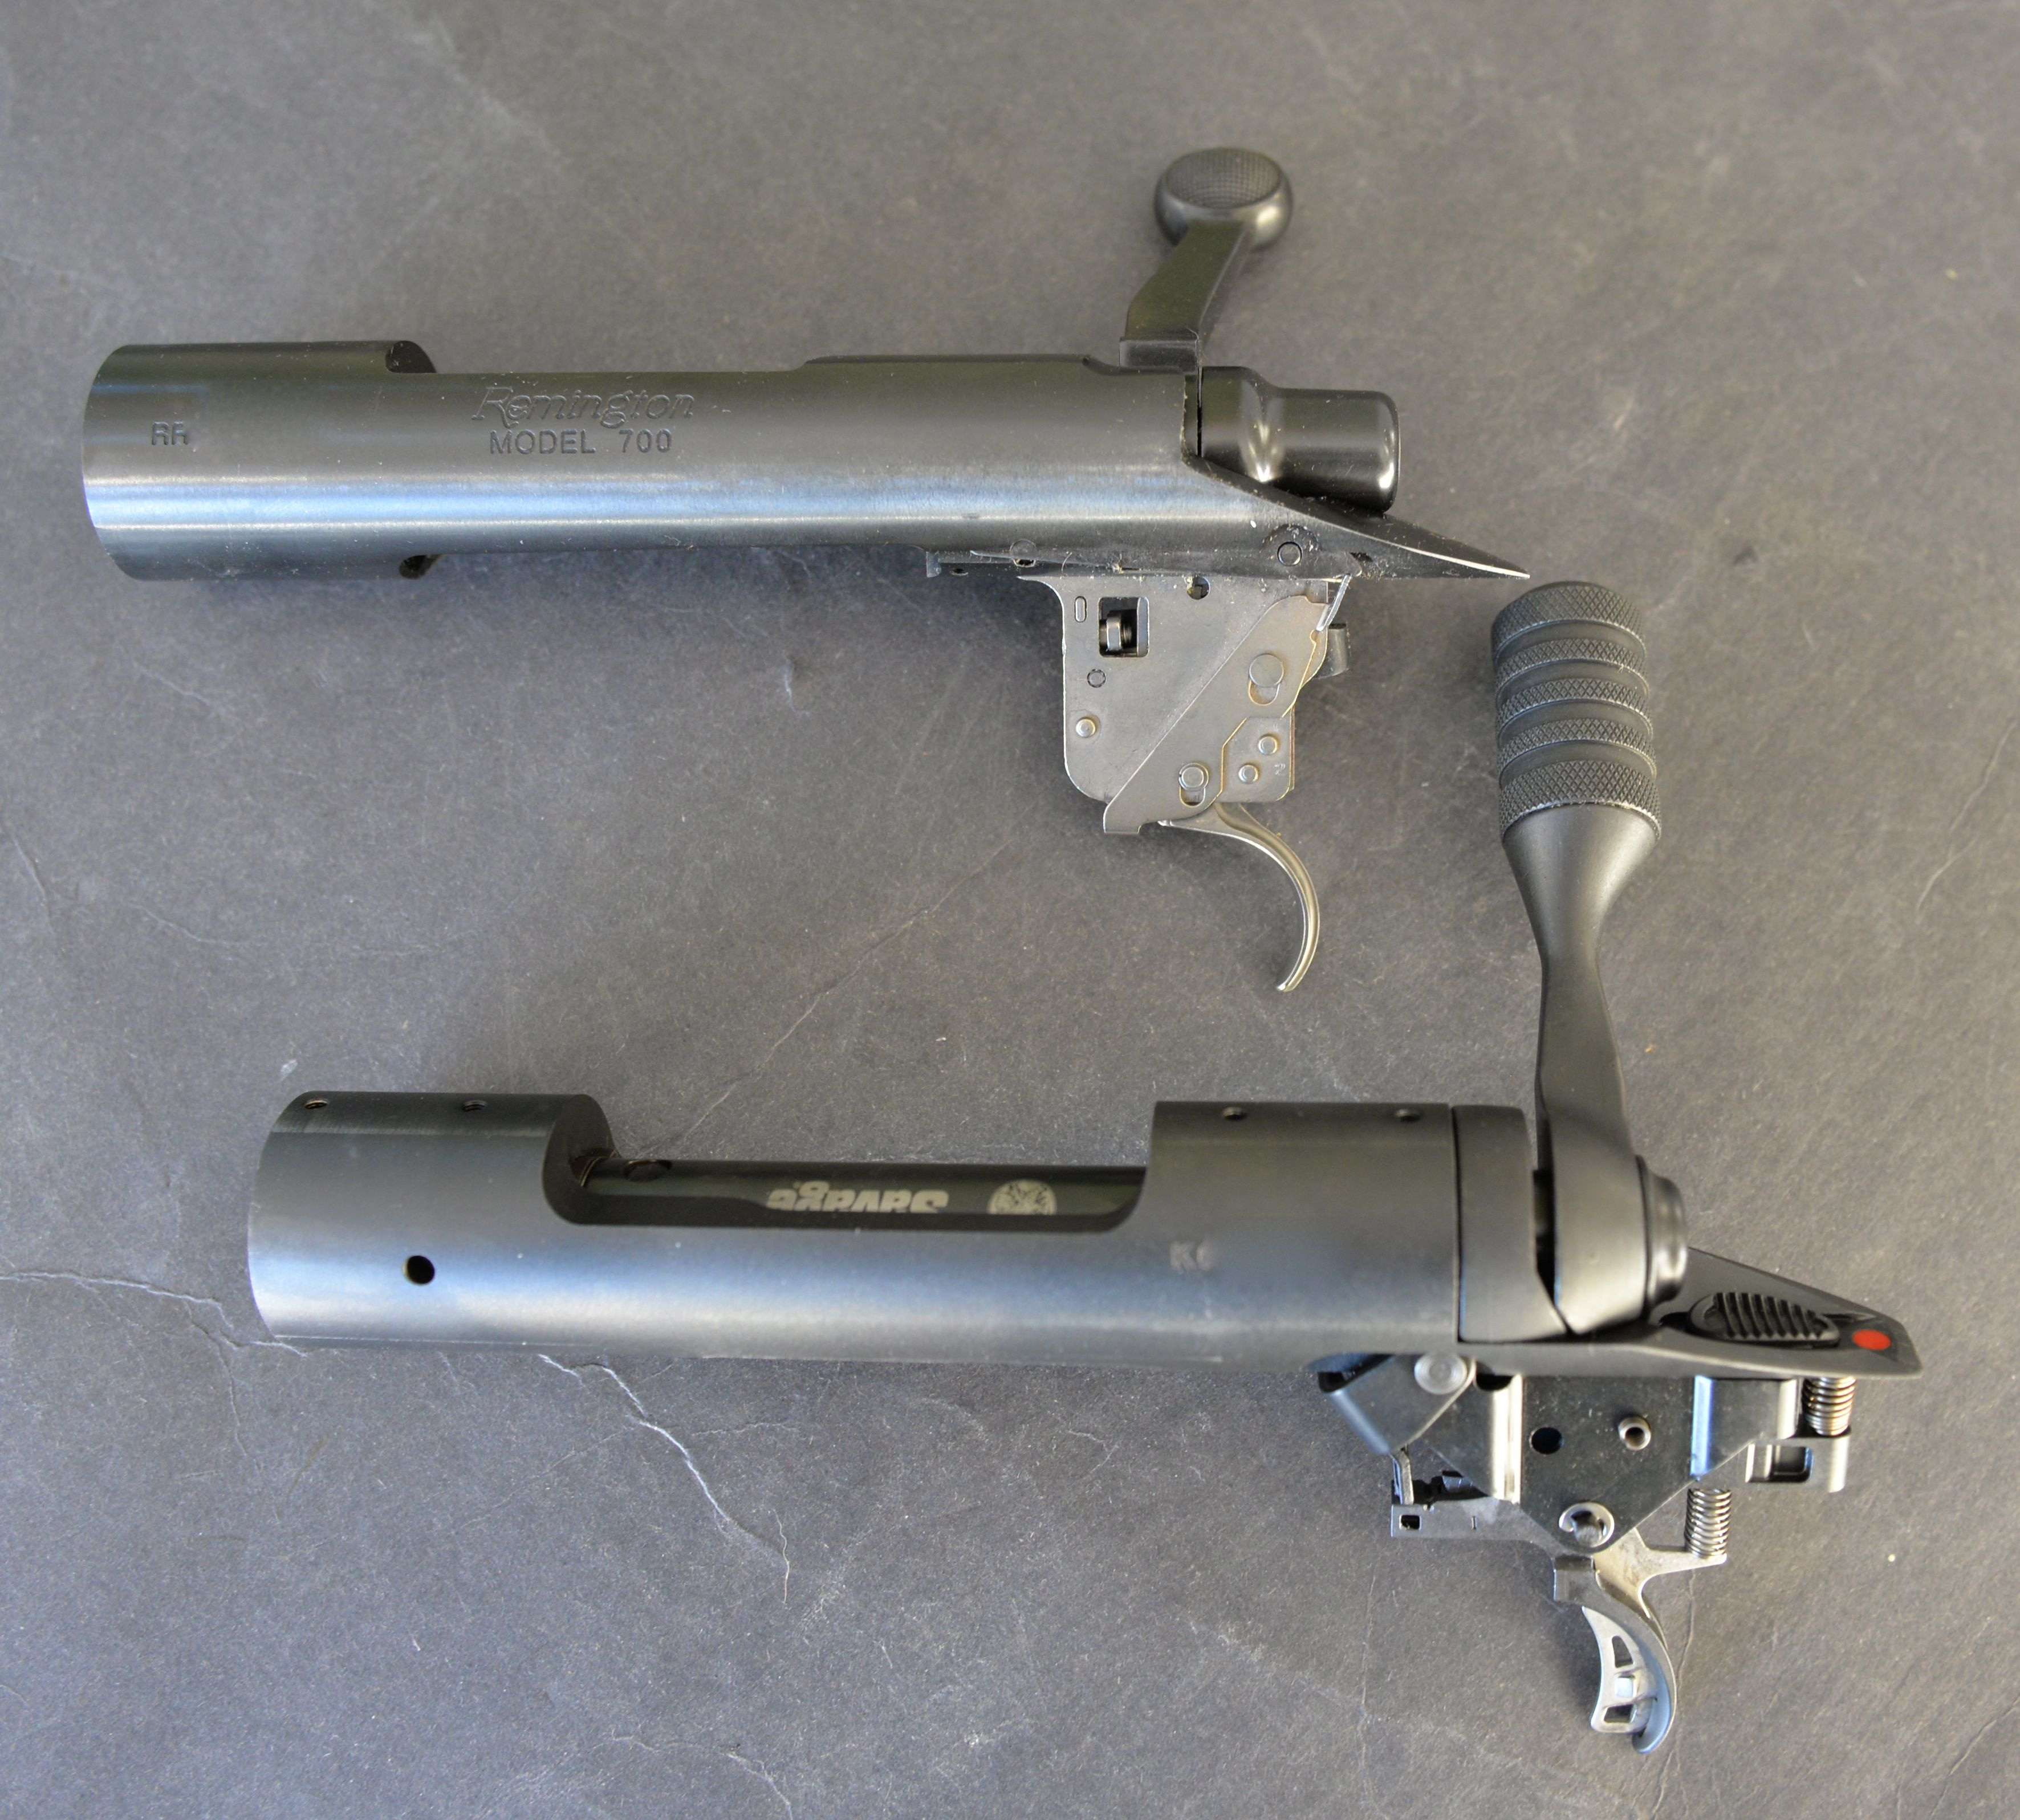 Remington 700 versus Savage 10/110: Comparative design notes